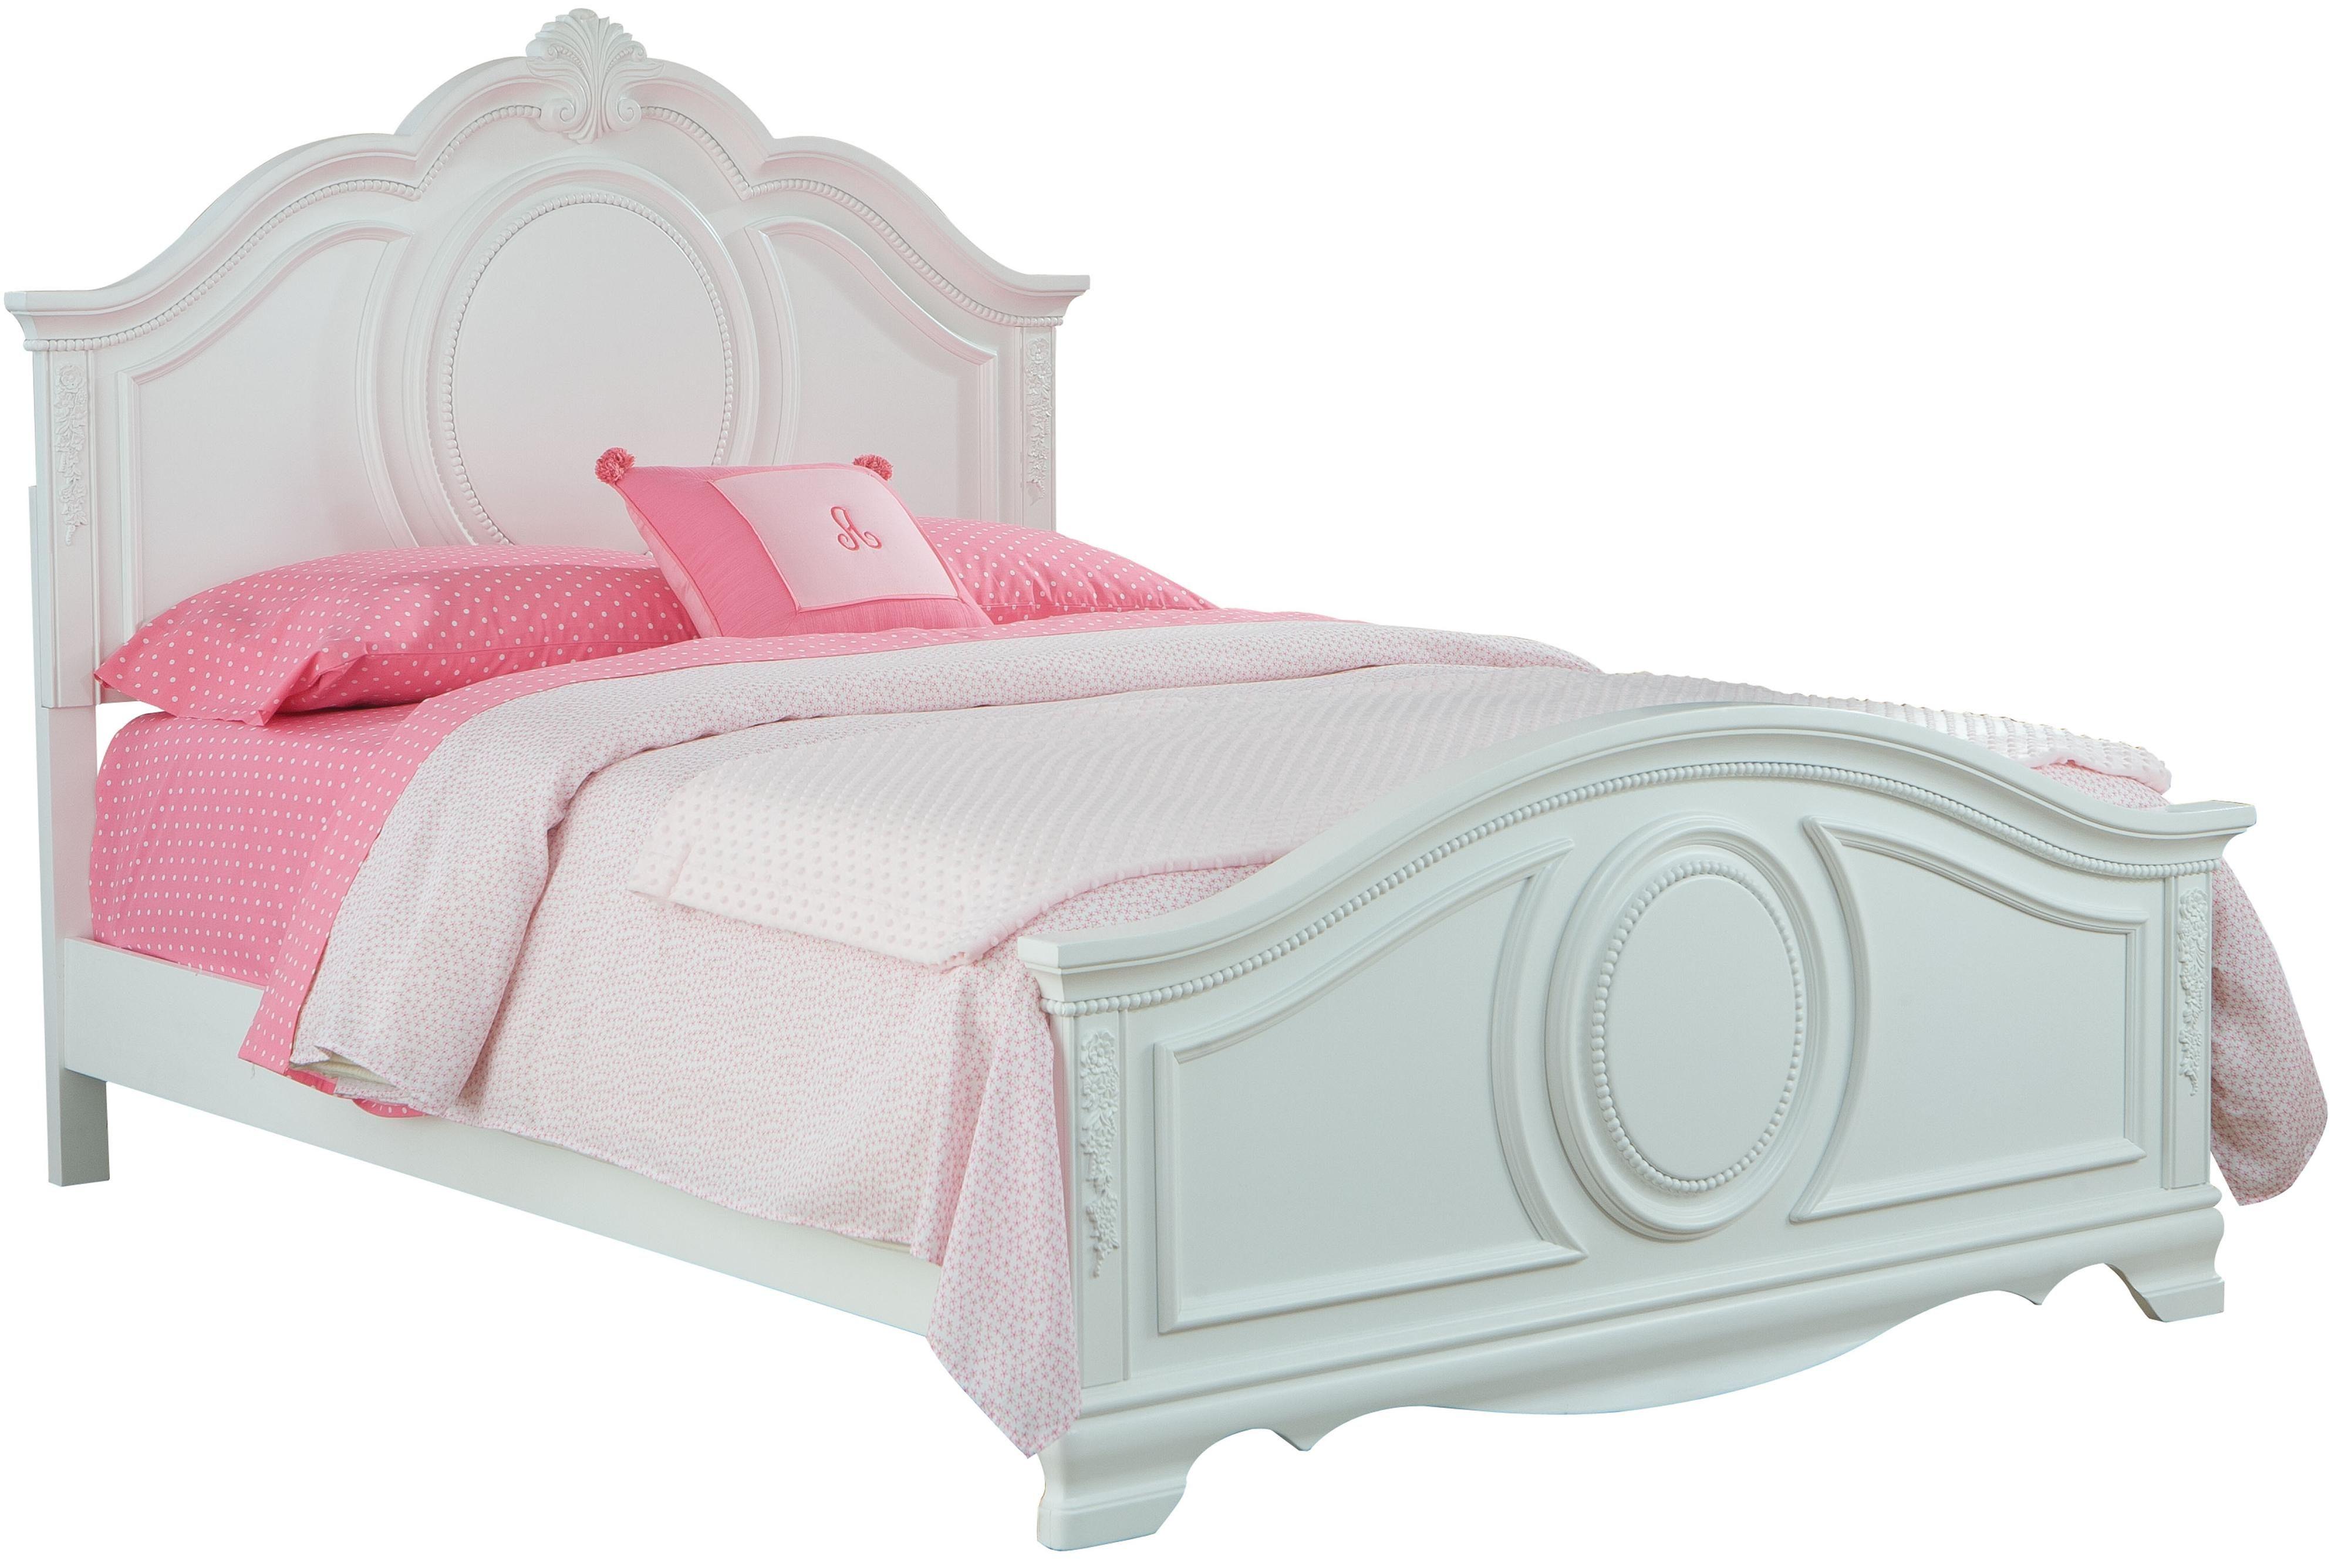 Villa Twin Sleigh Bed By Samuel Lawrence - Sophia Kai